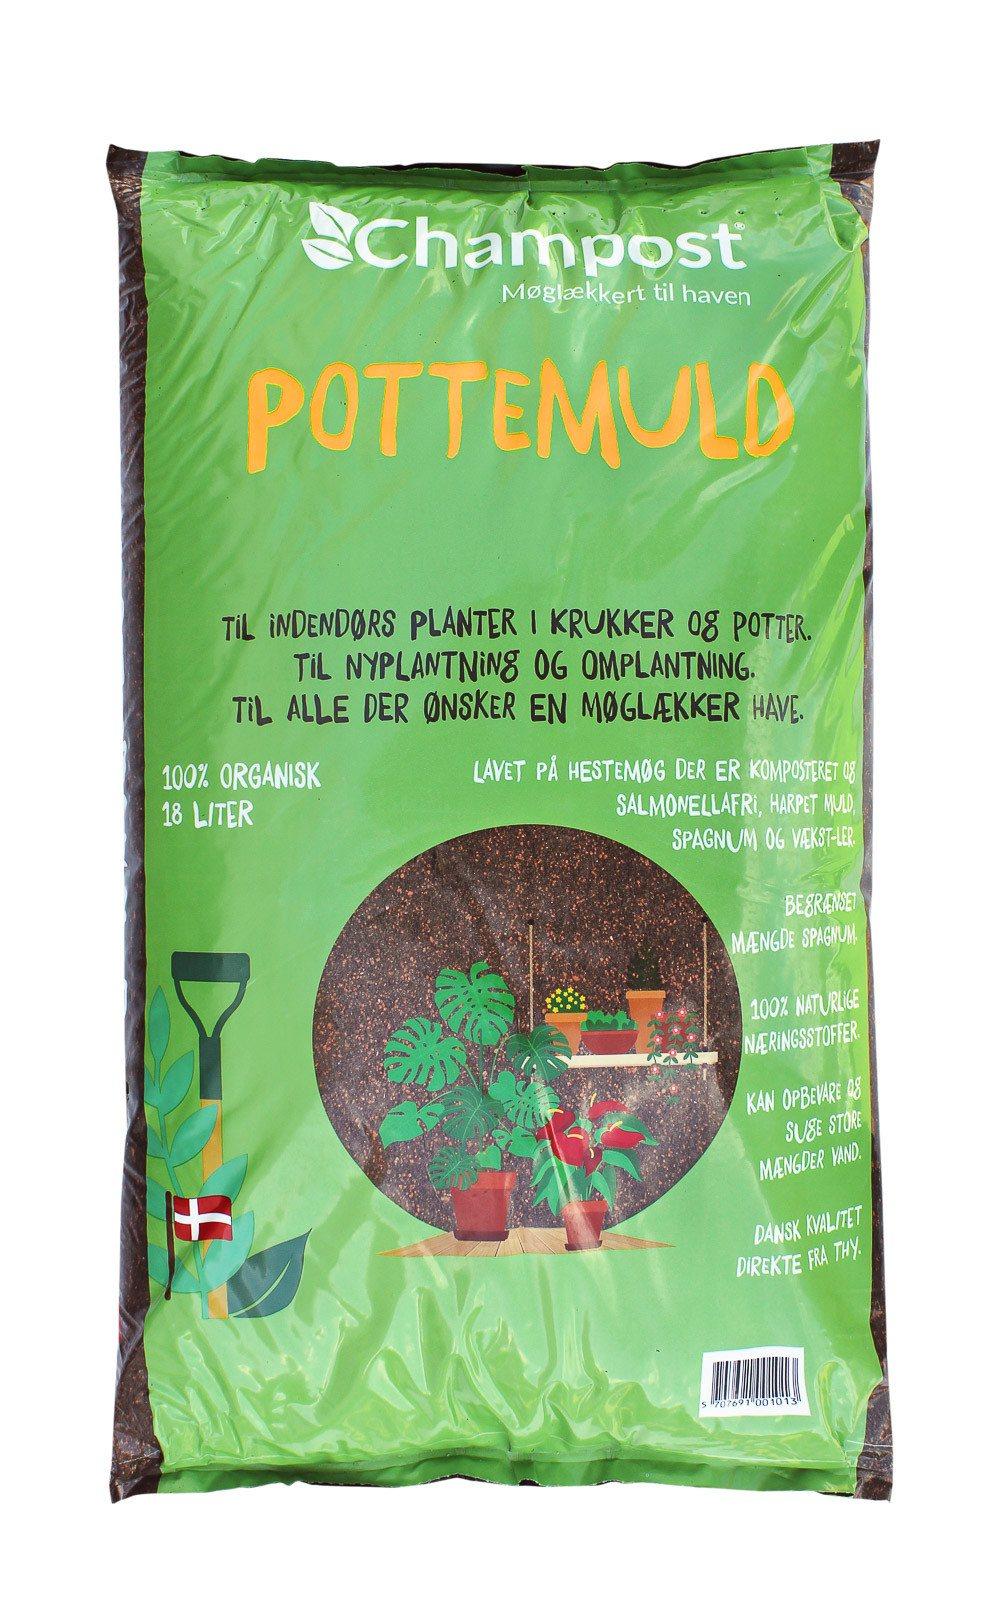 Champost Pottemuld 18 liter